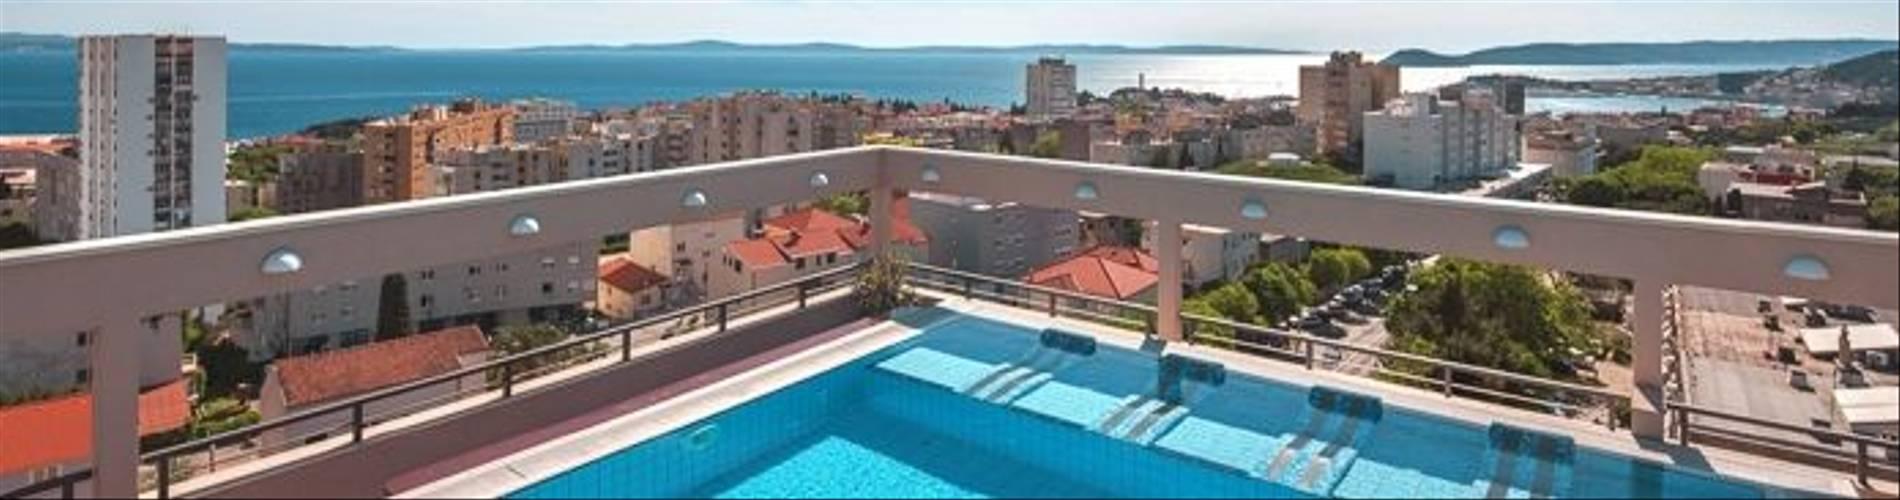 HotelResidence_DIOKLECIJAN_rooftop-pool-day-panorama_2048px_DSC03575-695x409.jpg